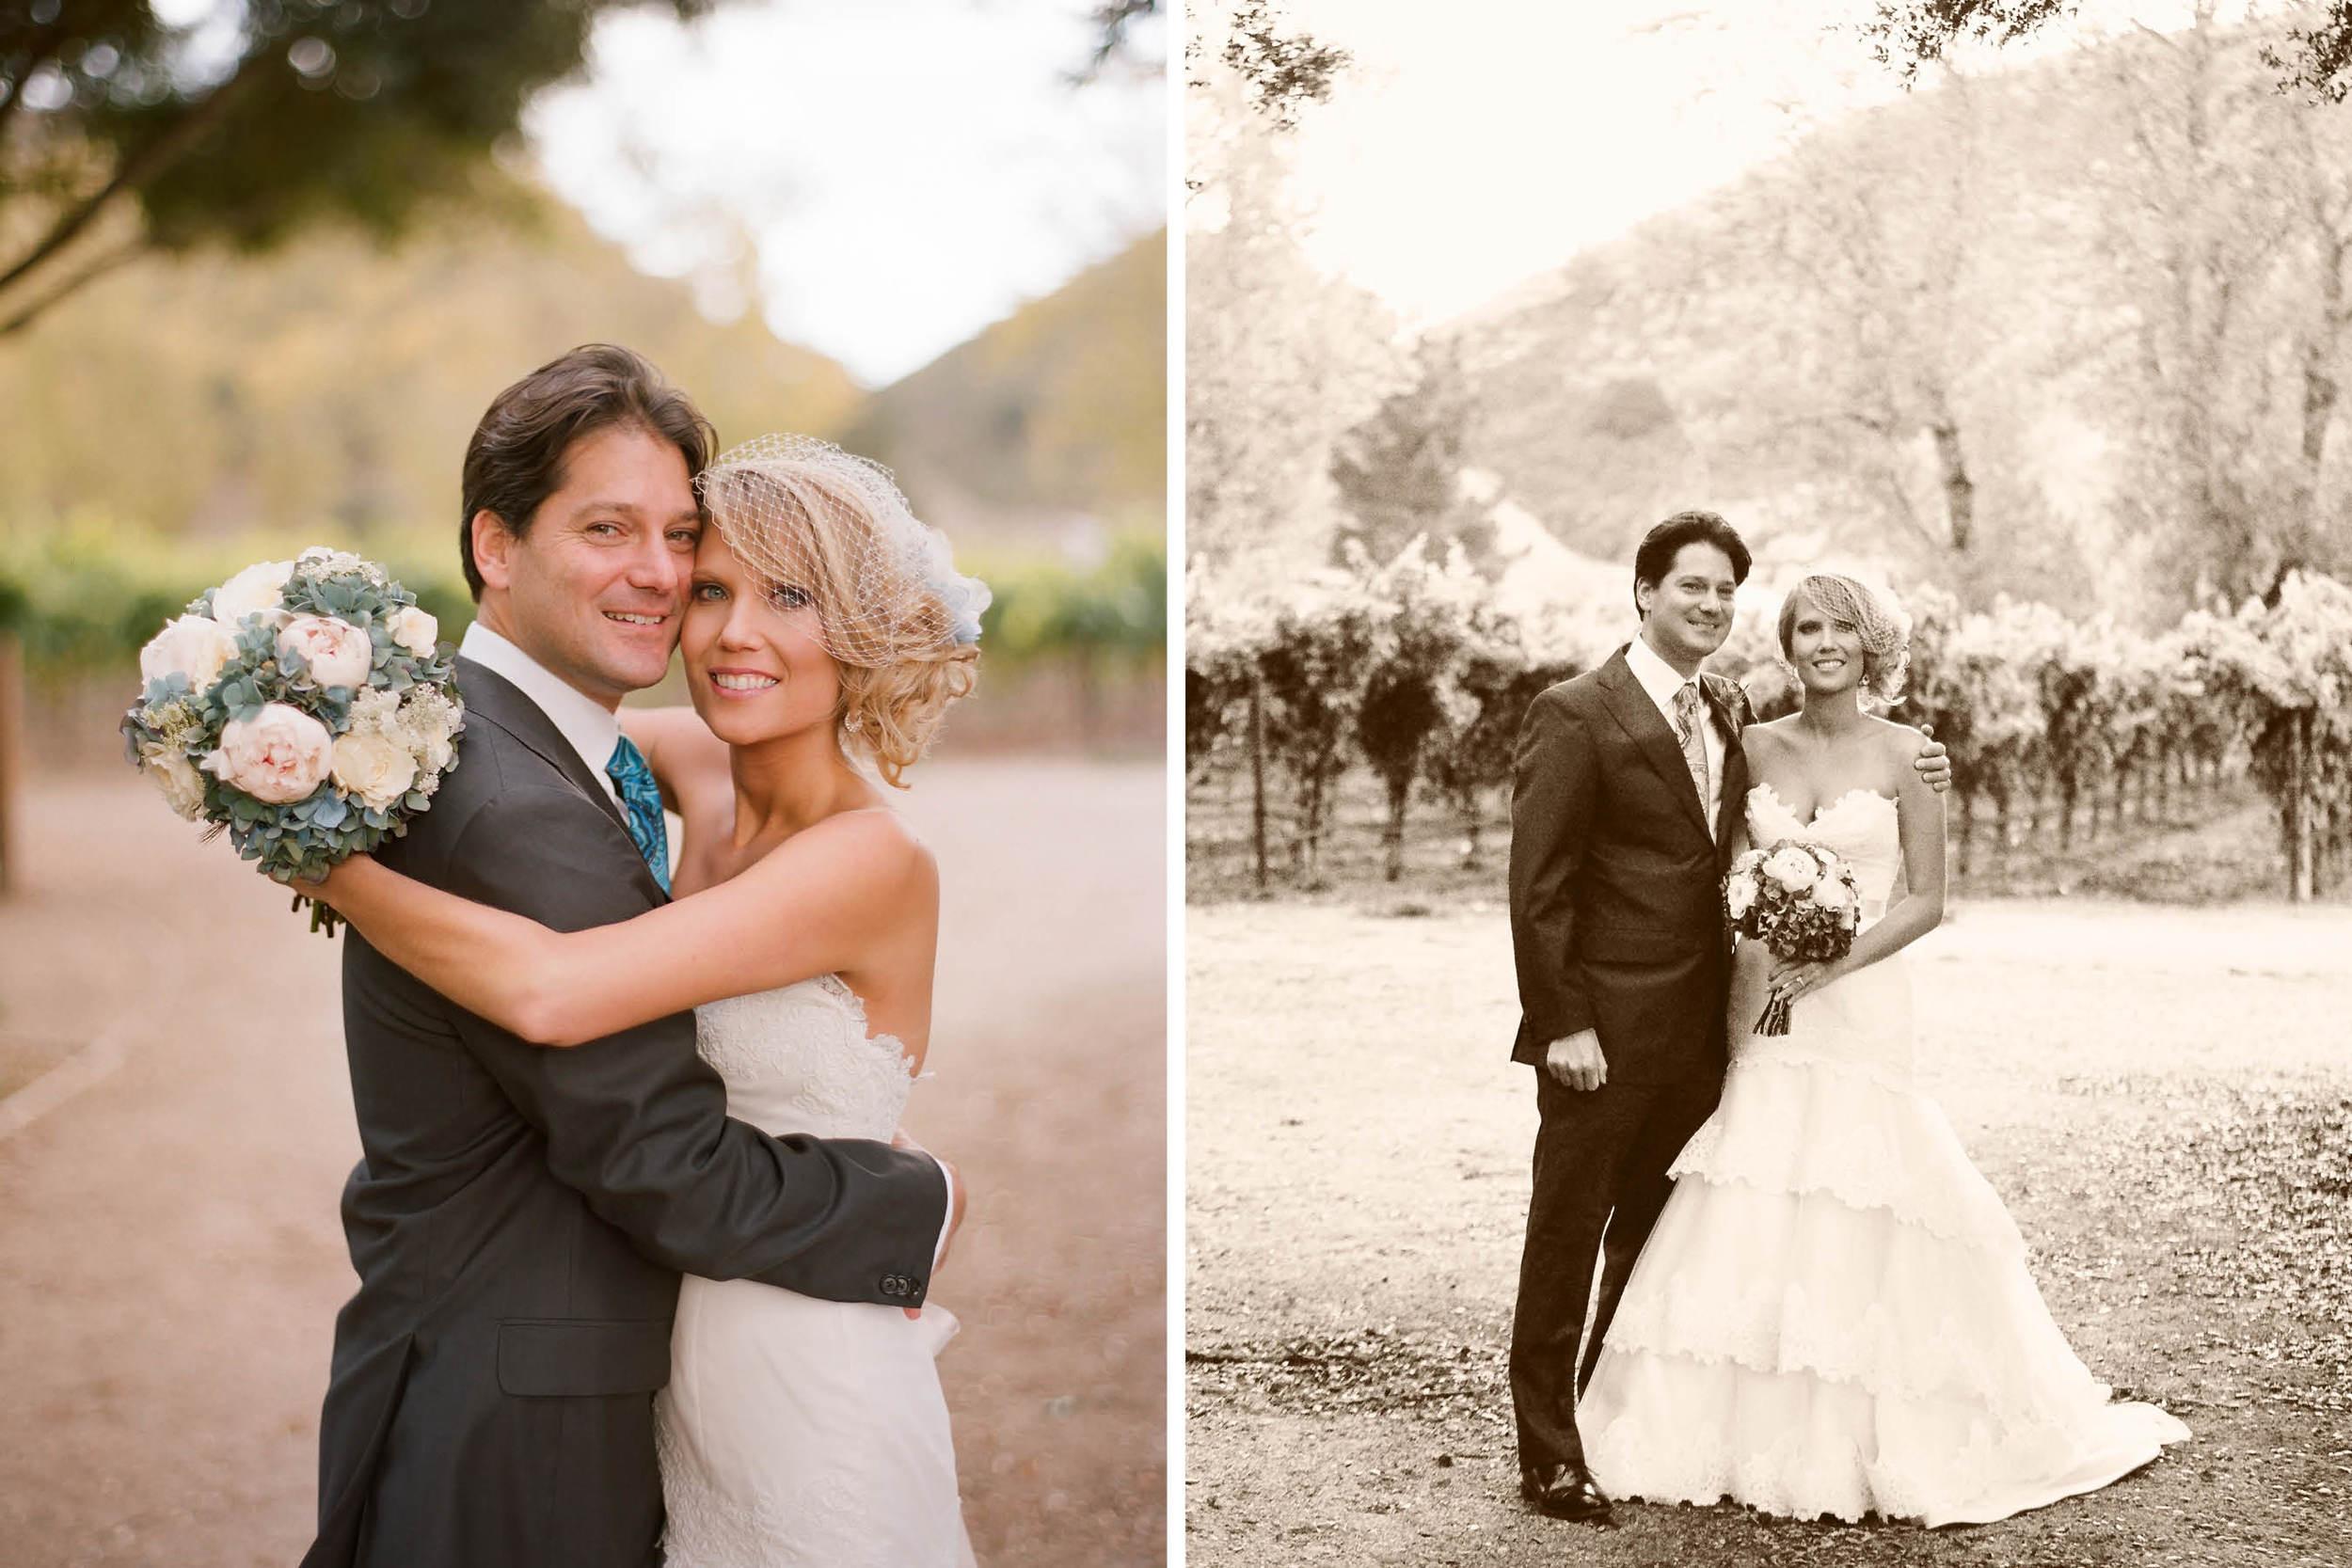 tres-hermanas-winery-vineyard-wedding-planner-coordinator-santa-barbara-ynez-maria (6).jpg